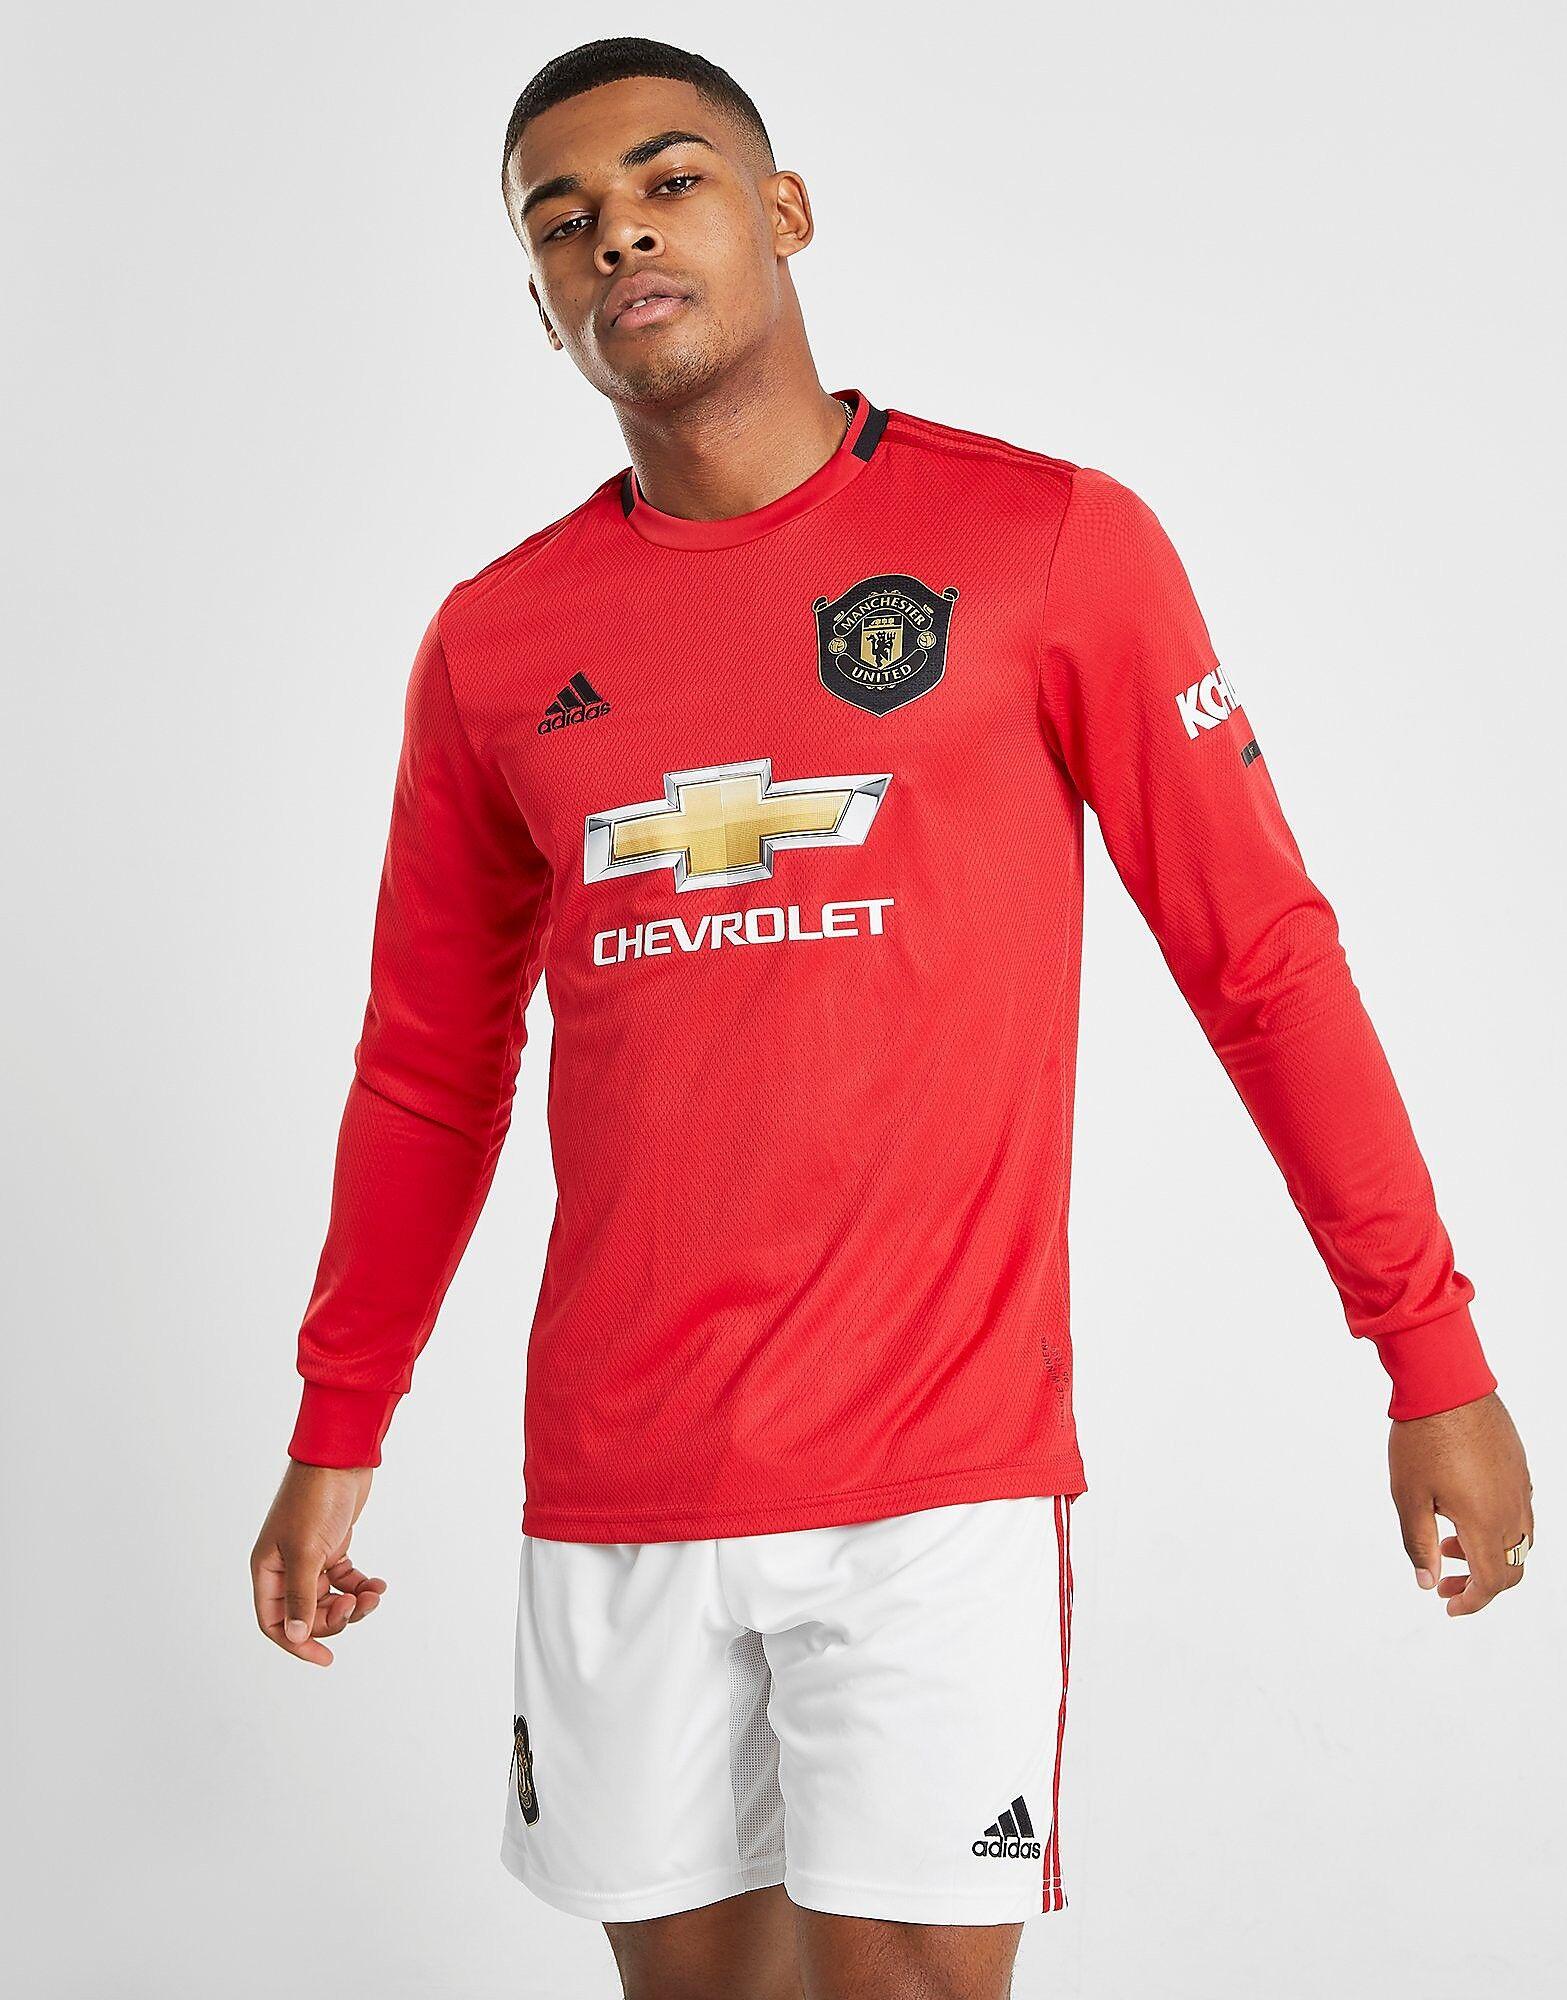 Image of Adidas Manchester United 19/20 Pitkähihainen Kotipaita - Mens, Punainen